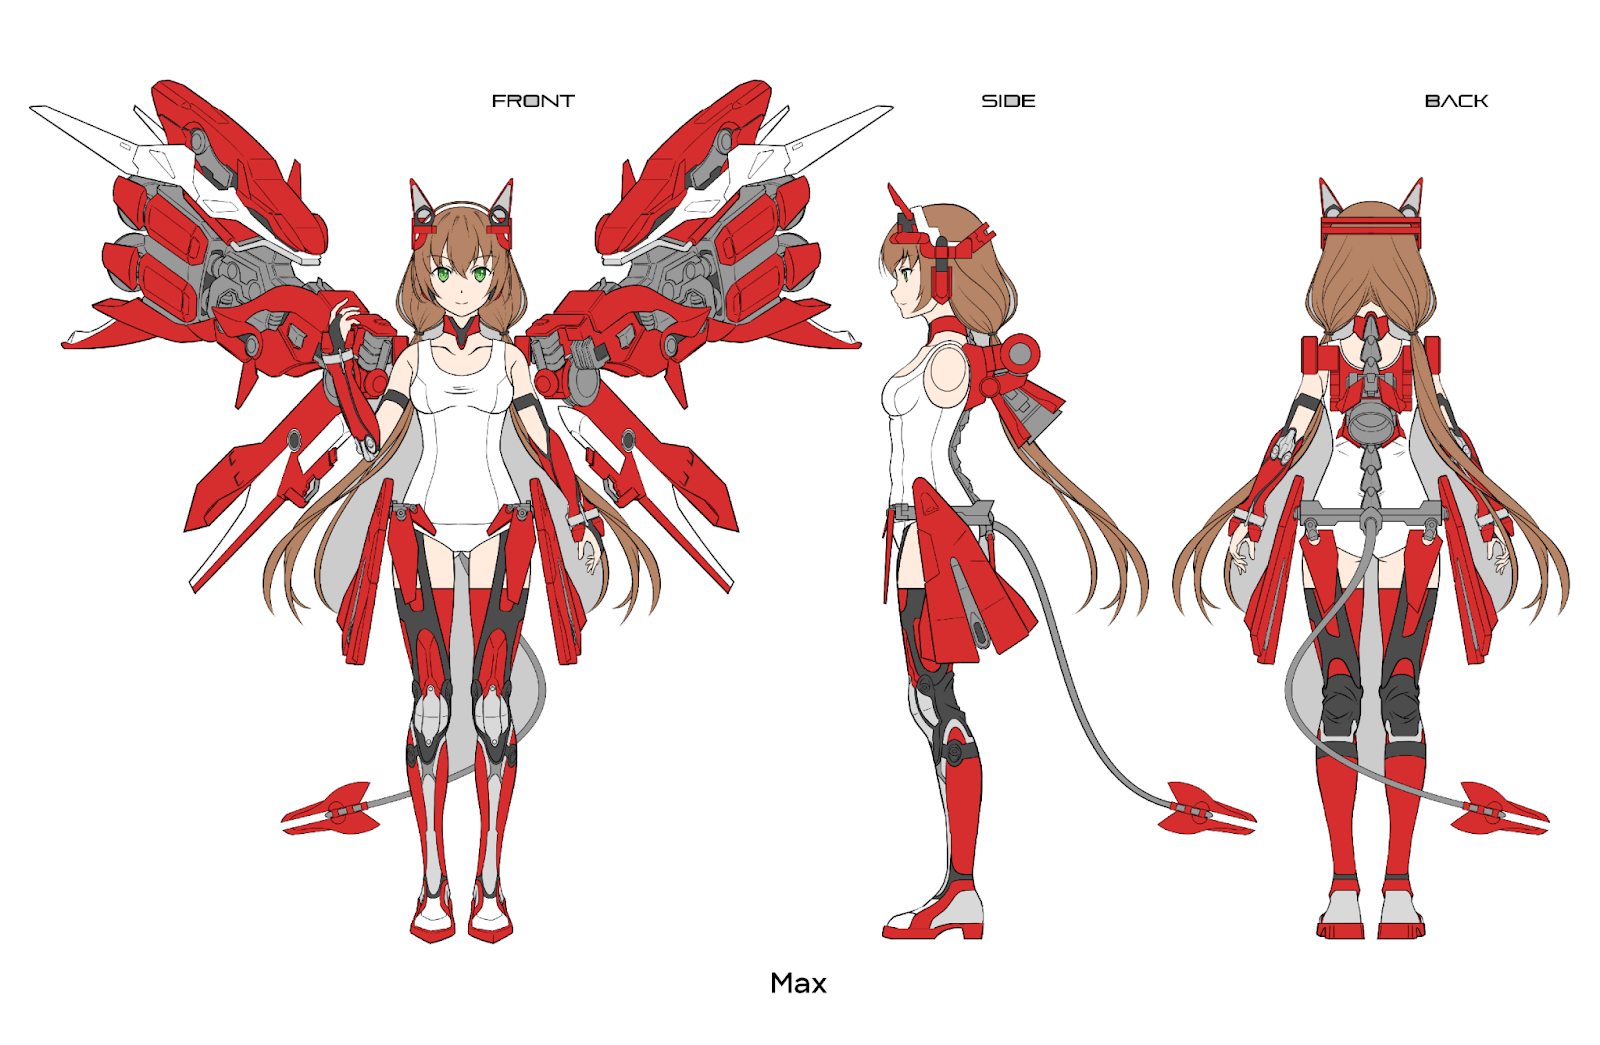 Anime Expo Mascot: Max